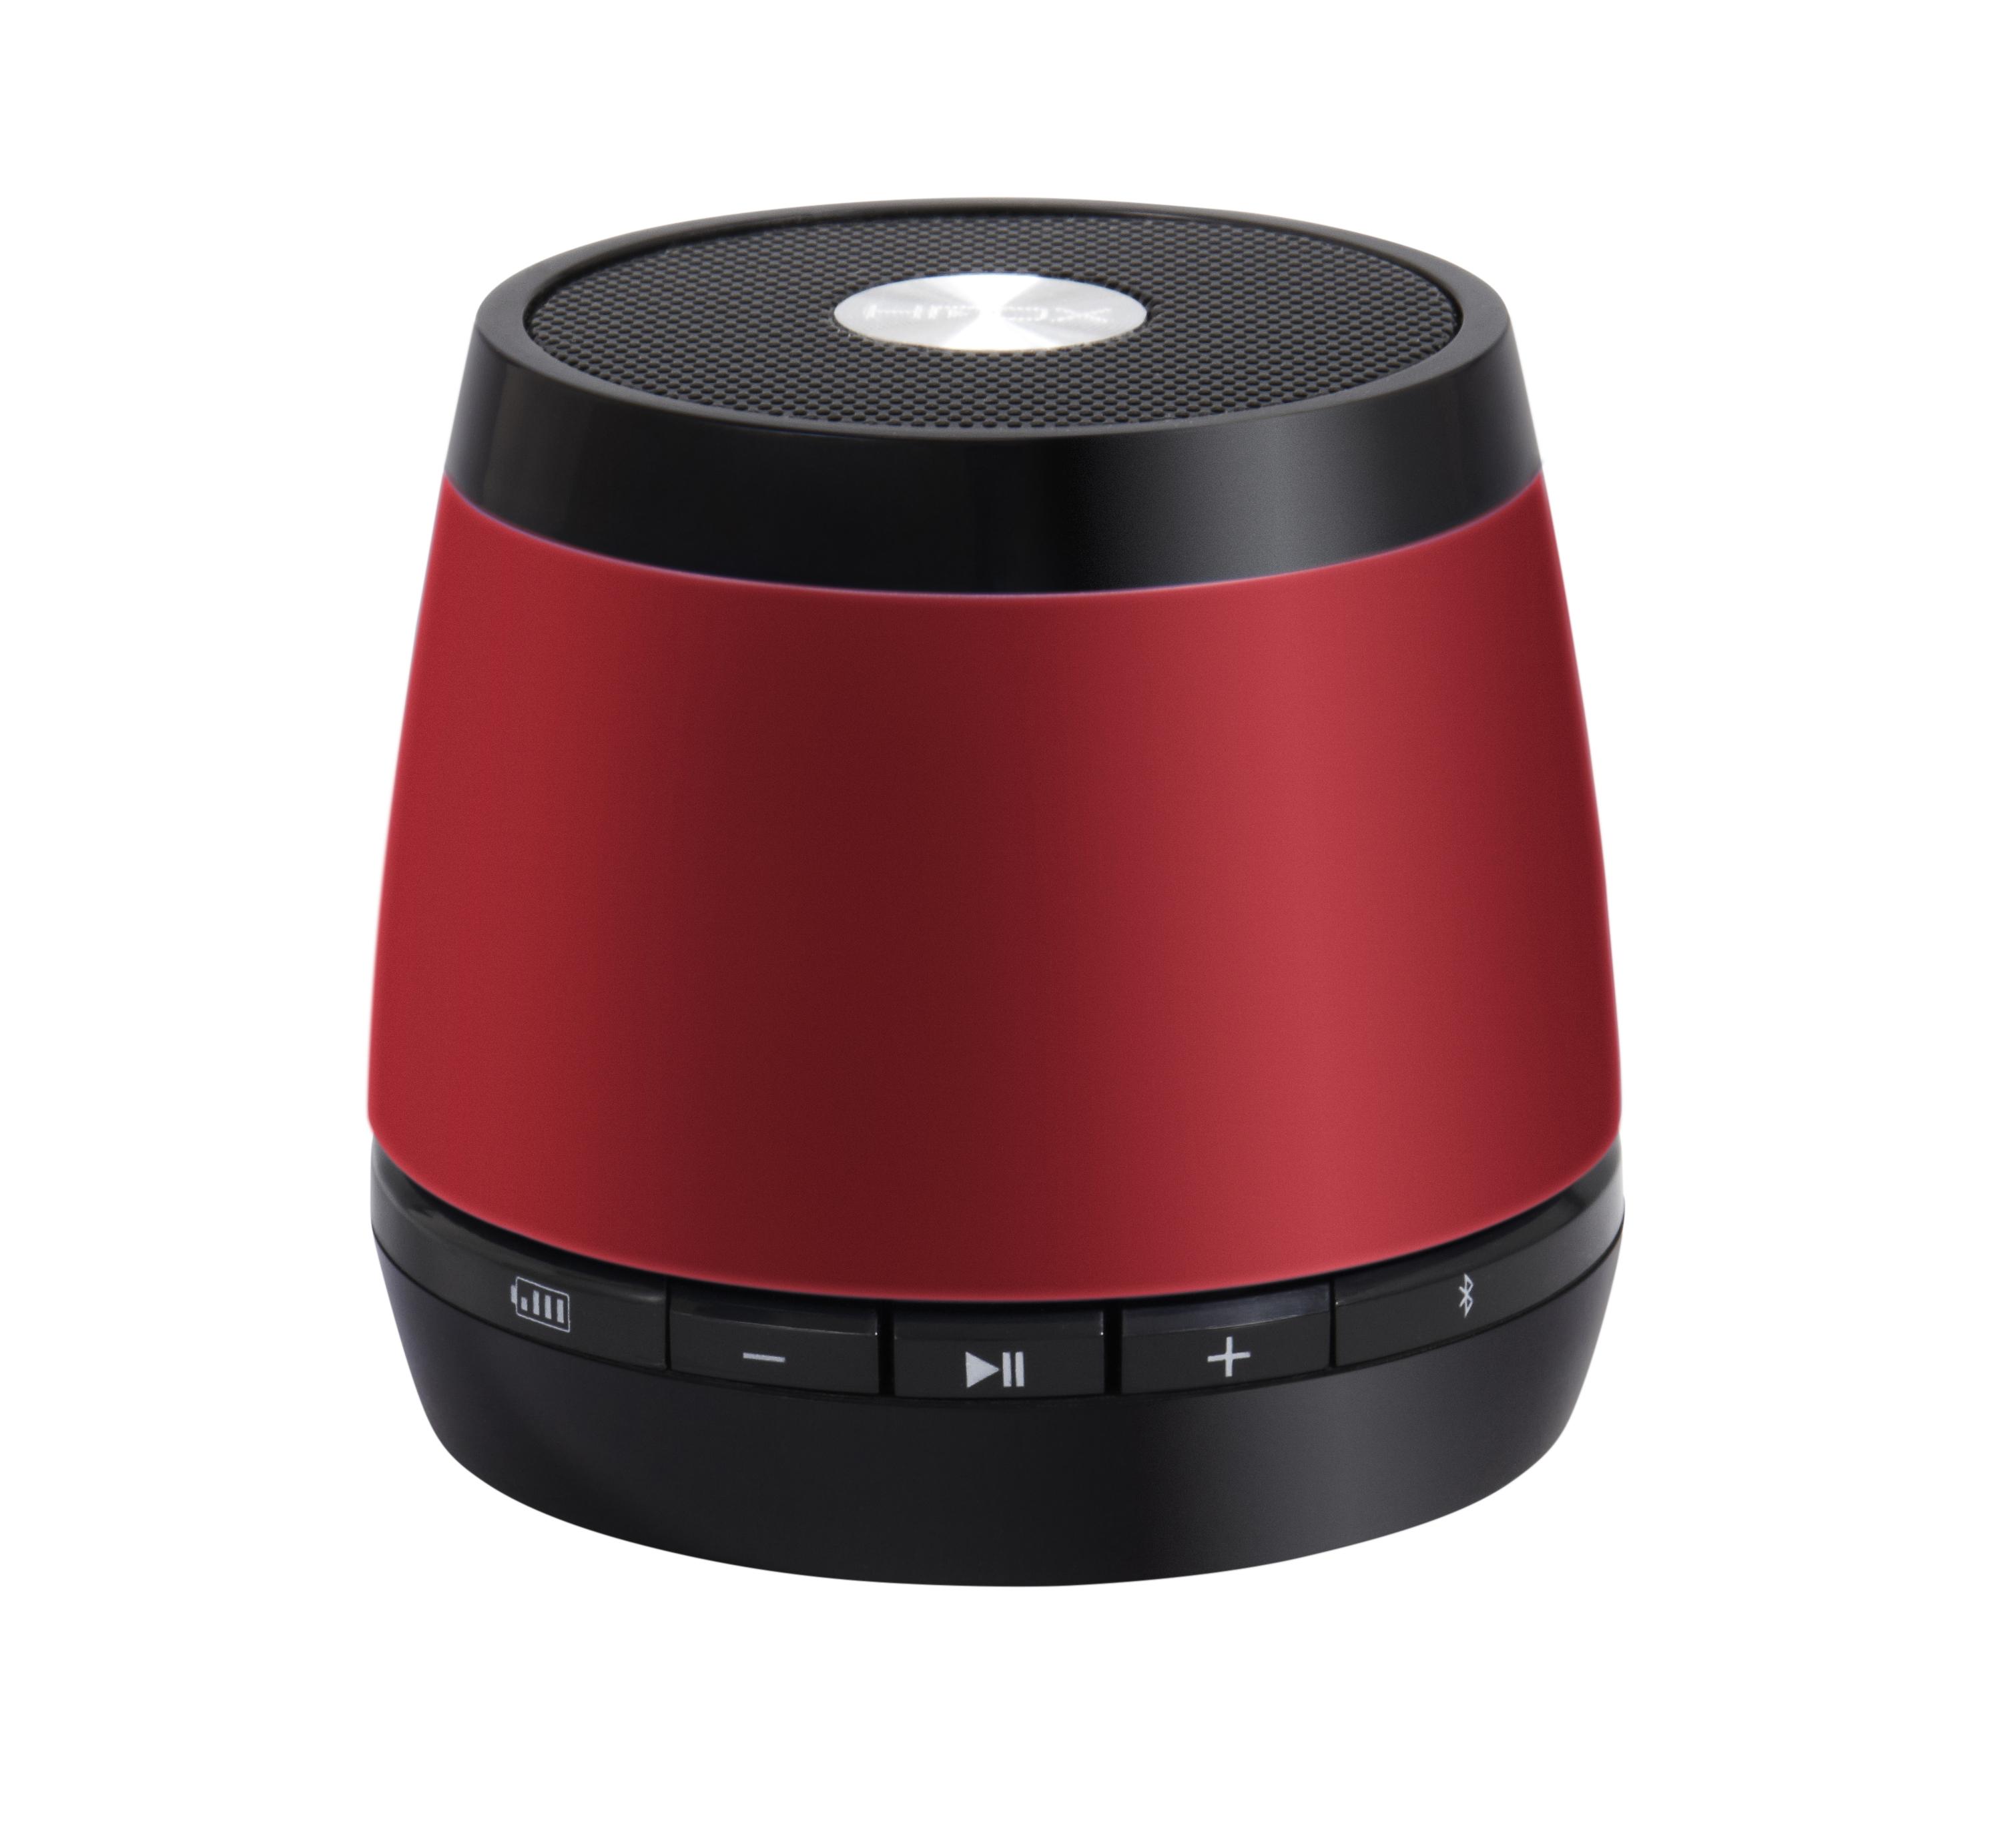 Homedics jam bluetooth portable speaker / Doino pizza